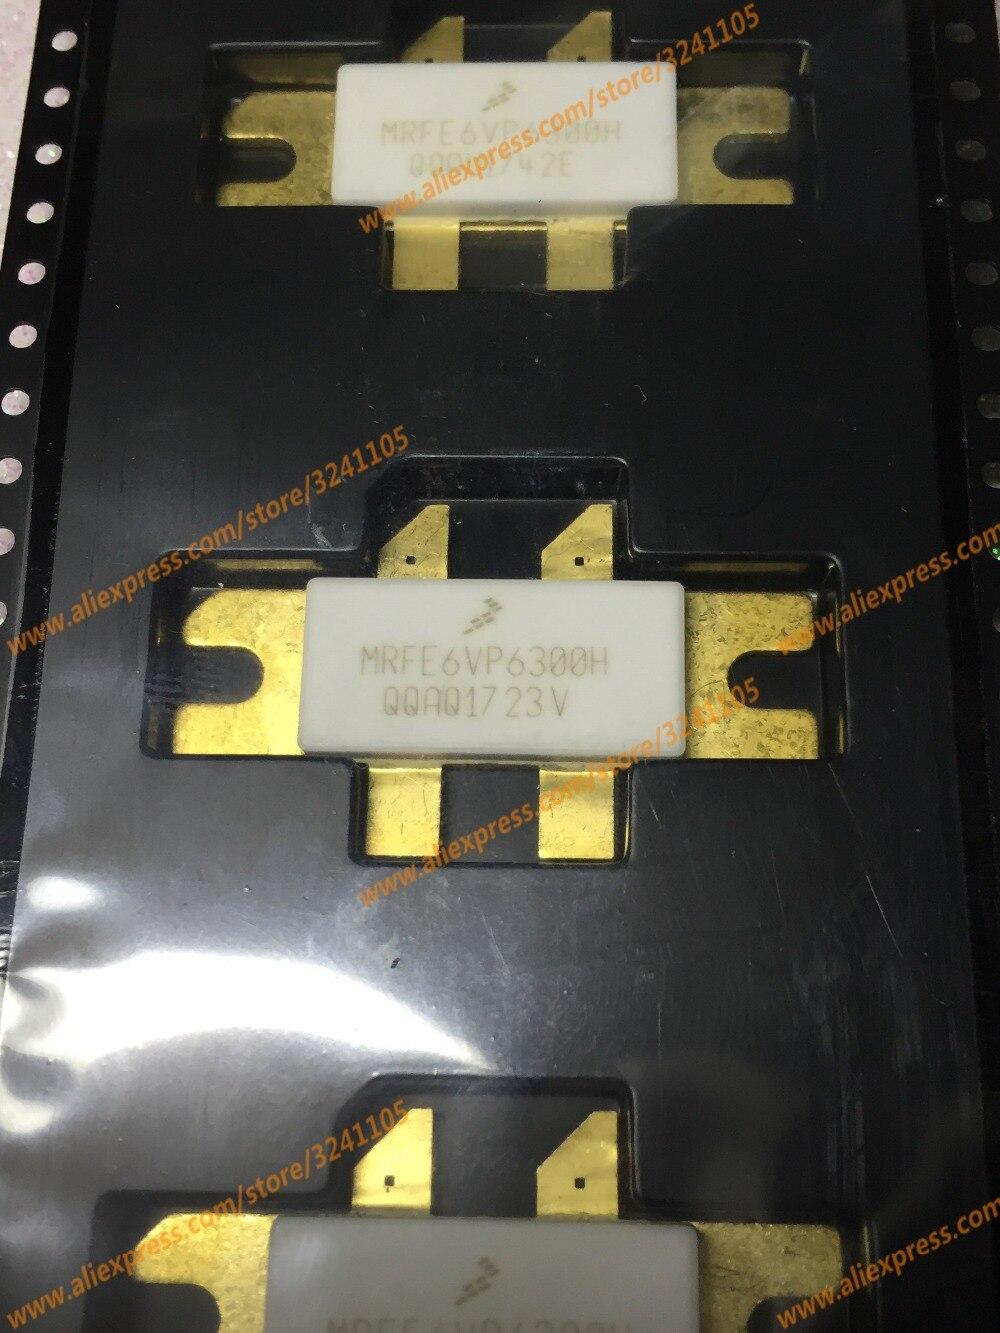 Free Shipping New Original  MRFE6VP6300H  MRFE6VP6300HR5 With Taping